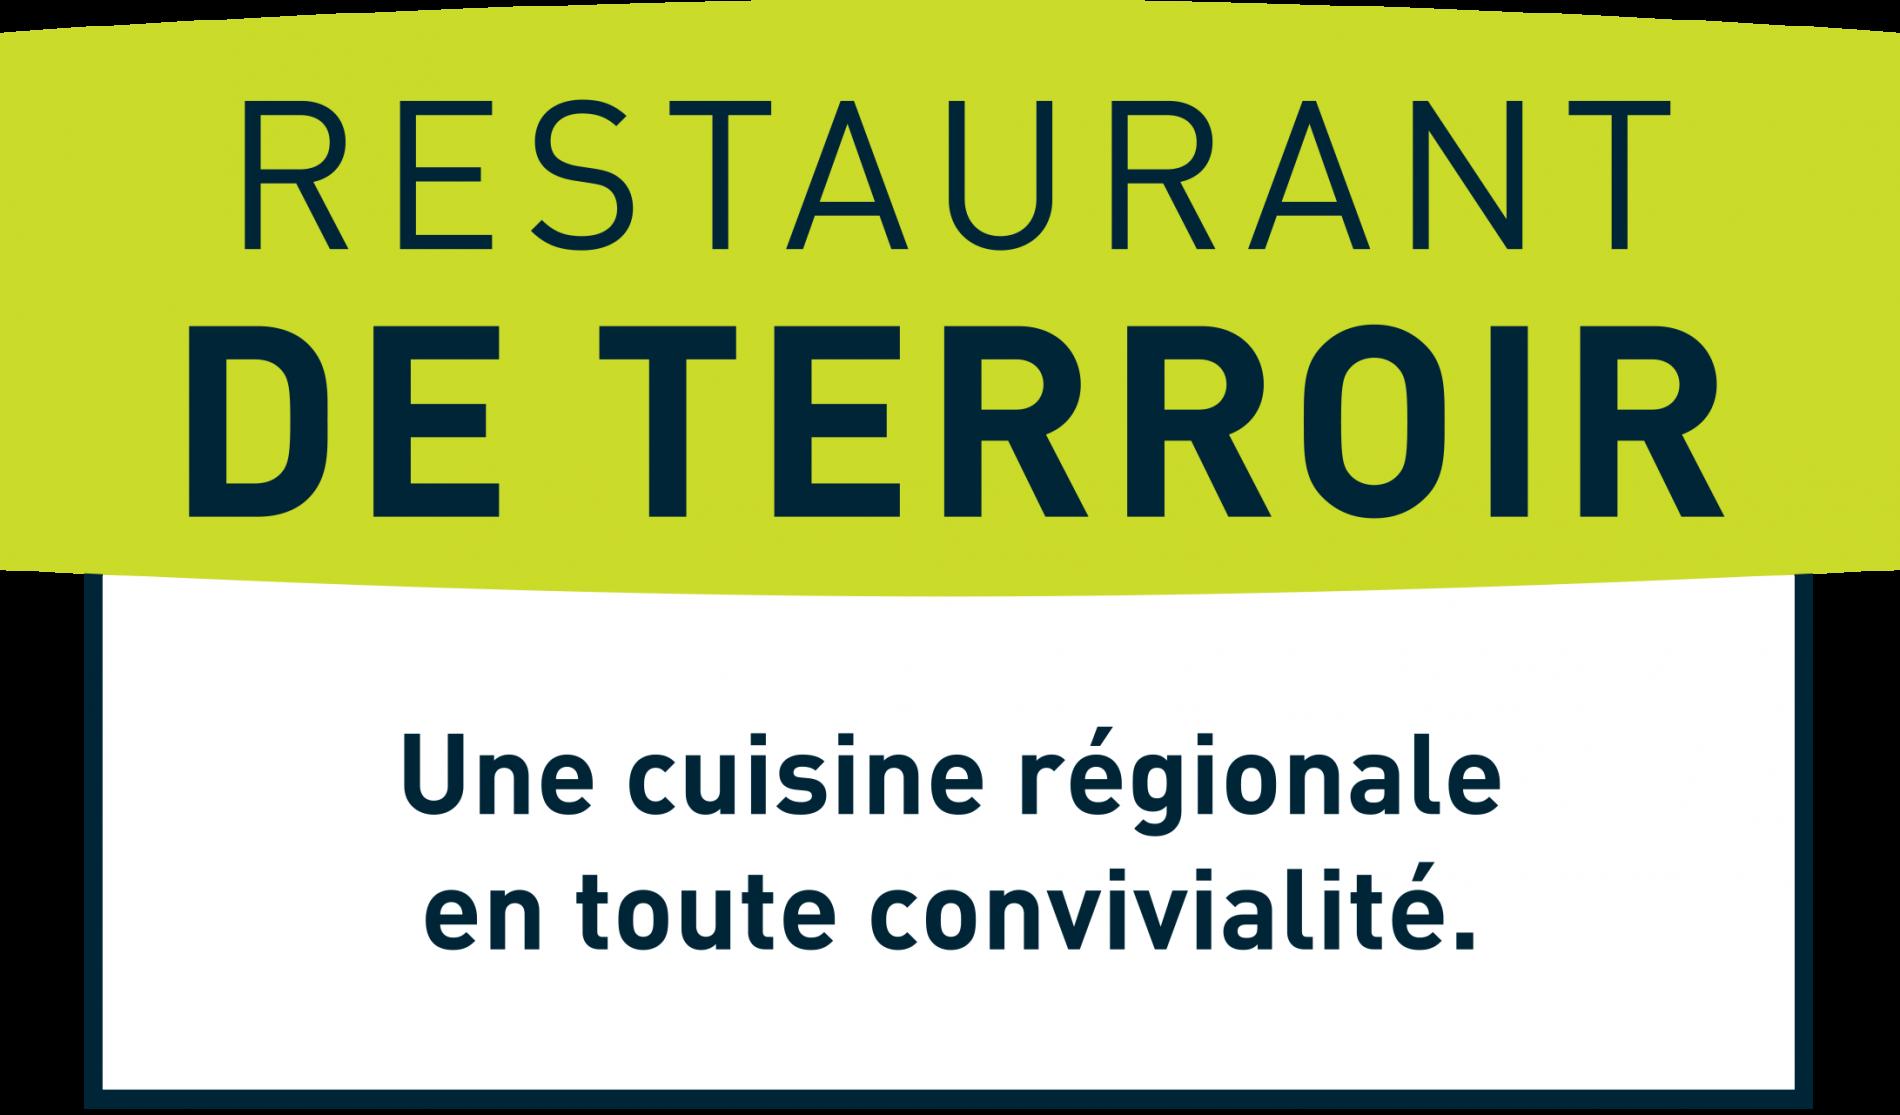 Logis Hotel Essentiel et Restaurant de Terroir